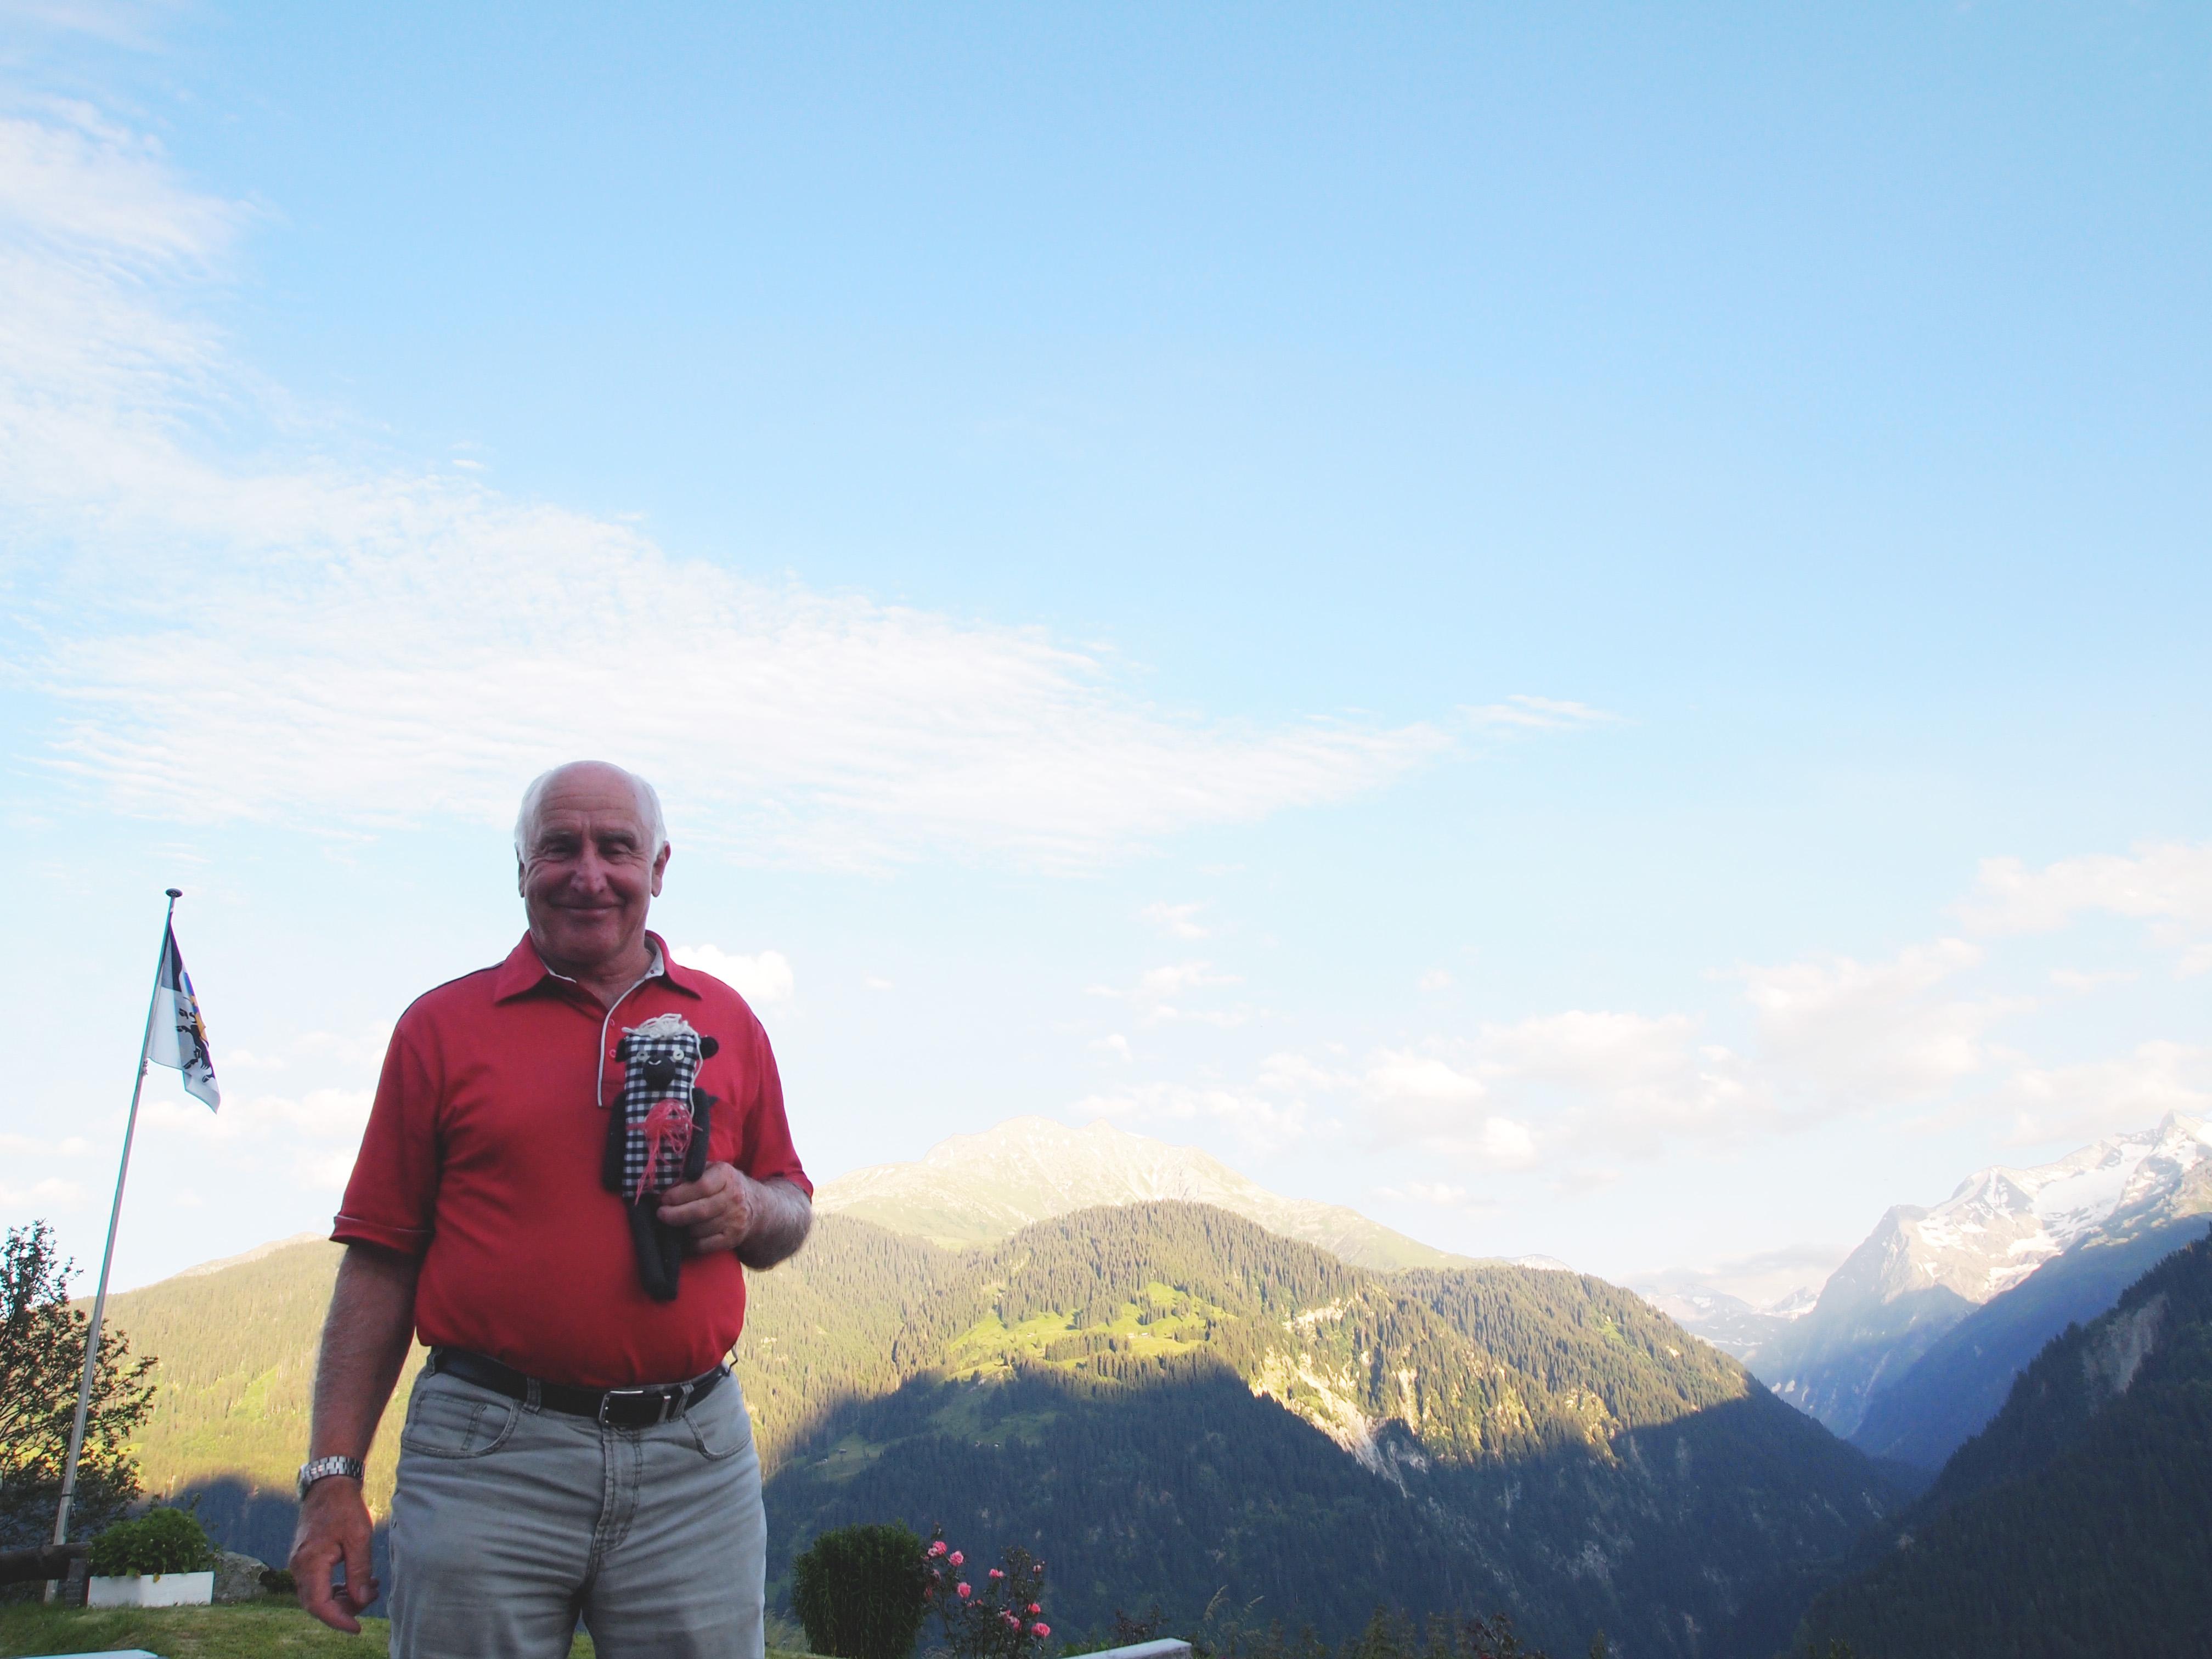 Sumvitg, Svizzera